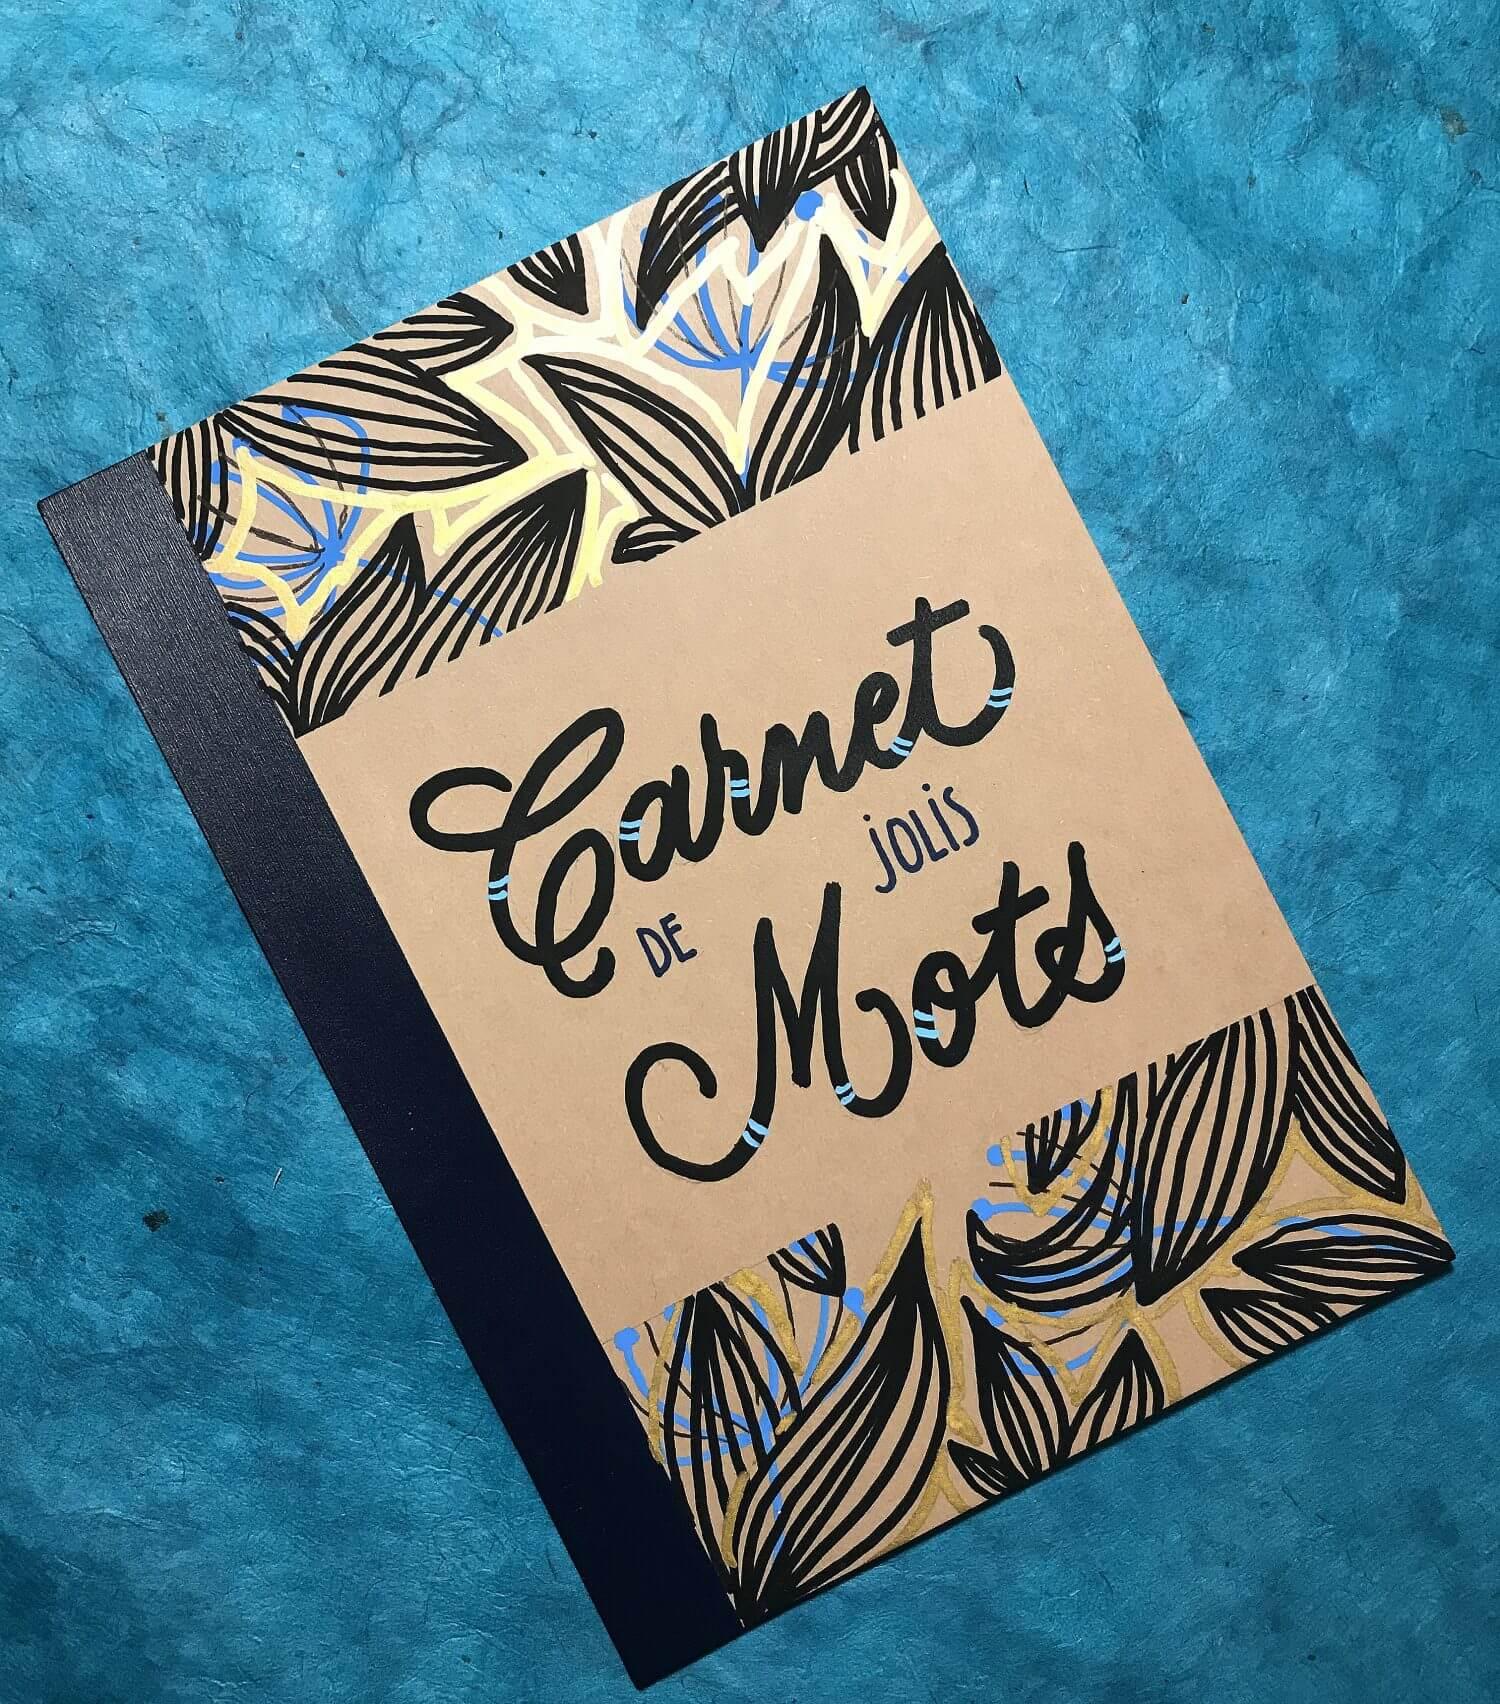 #carnet #lettering #artnouveau #handlettering #notebook #DIY